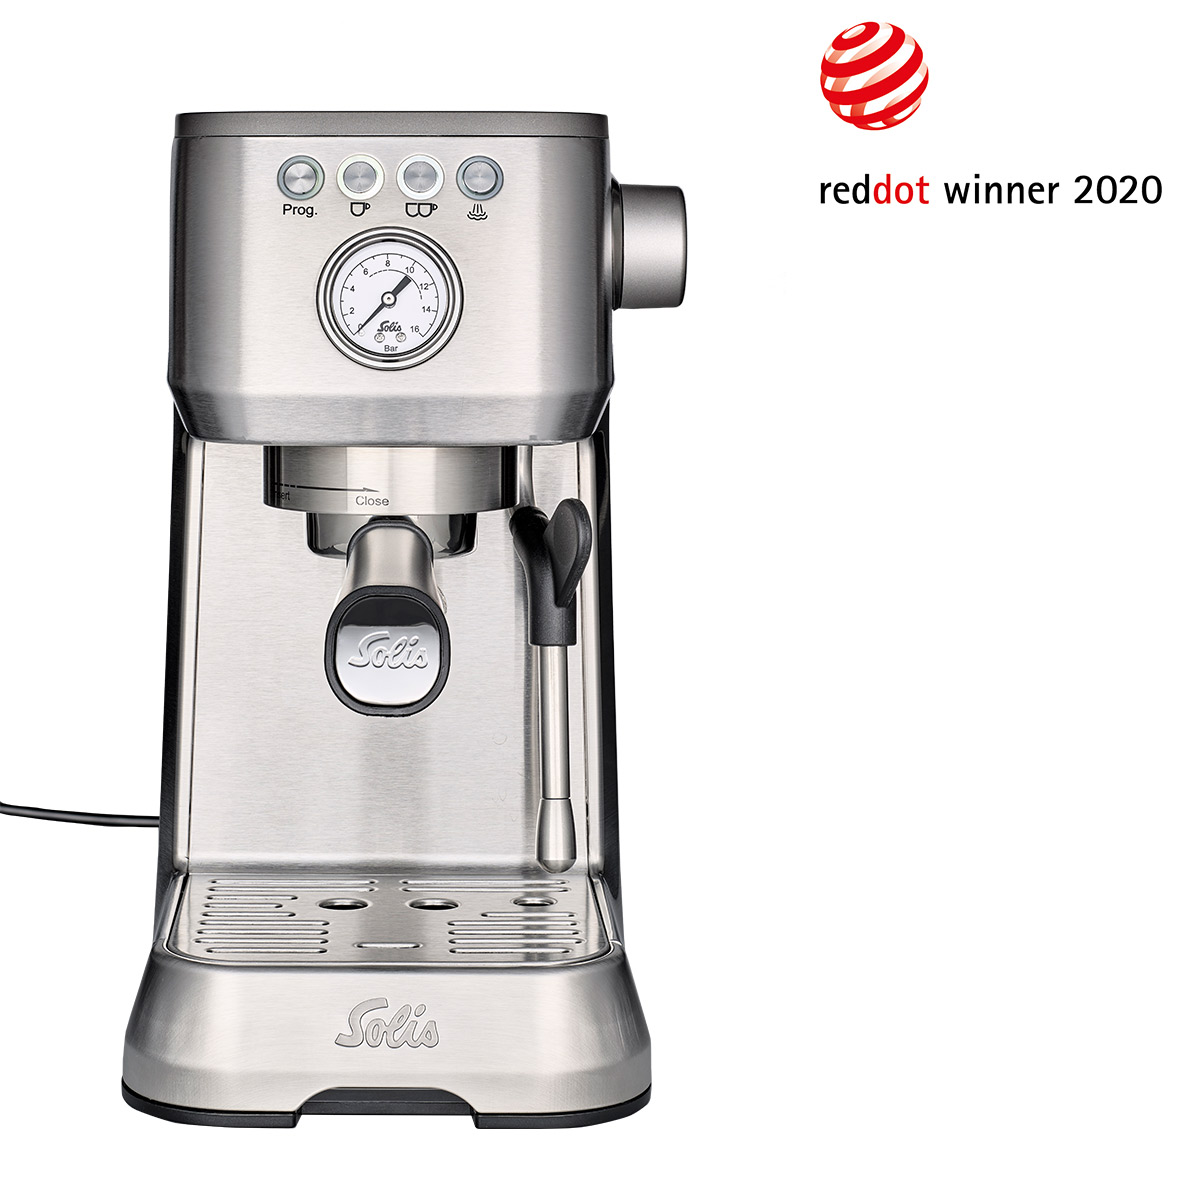 kaffeemaschine barista perfetta plus redot winner 2020 solis